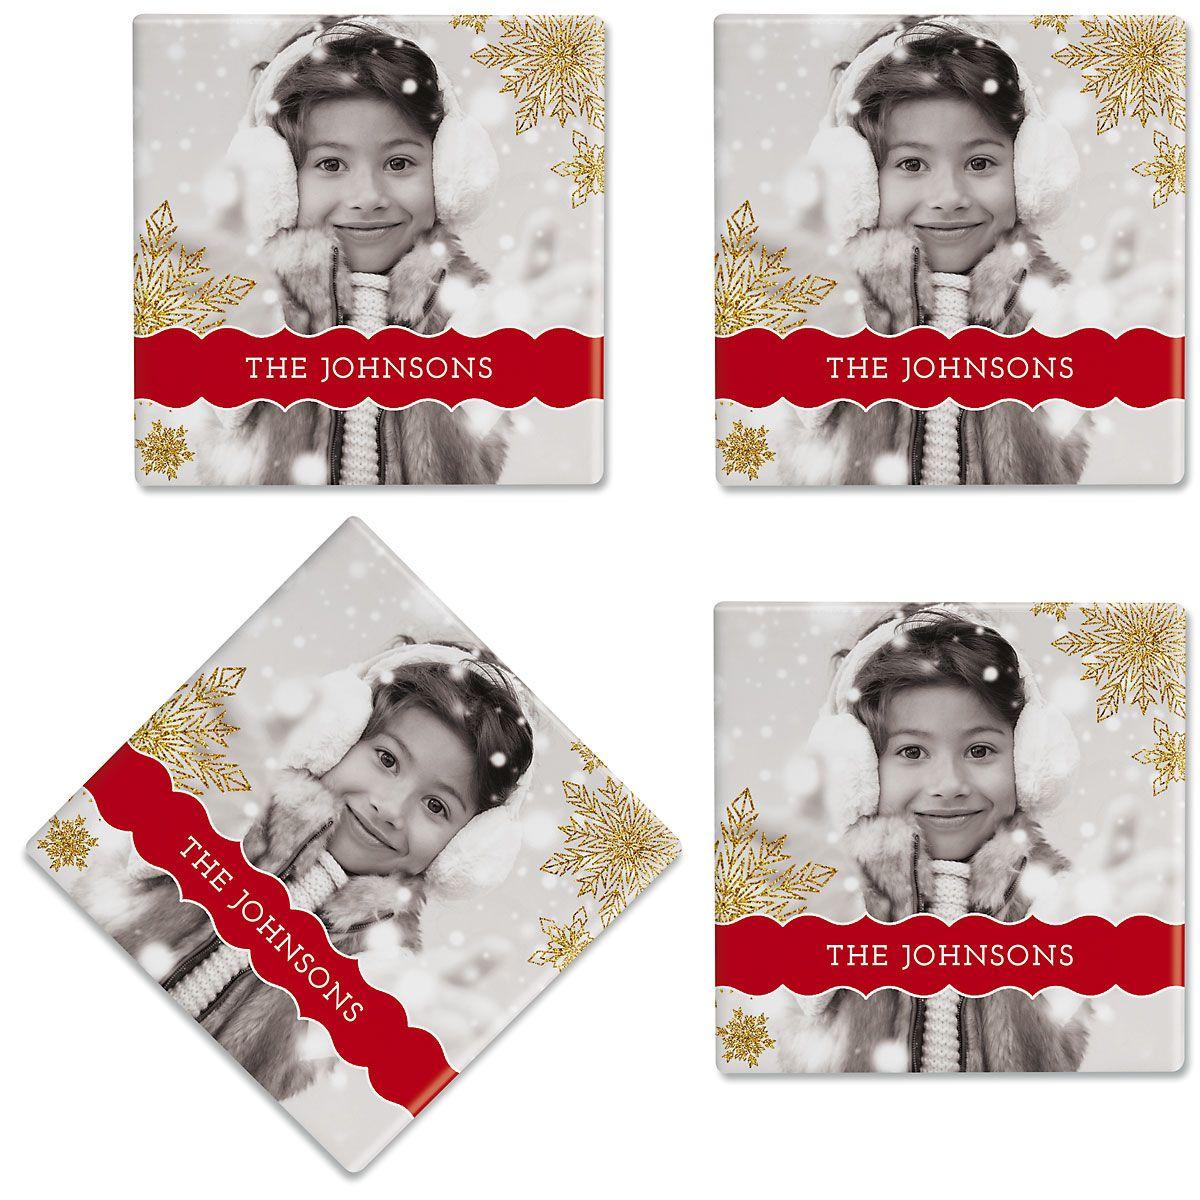 Glitter Snowflake Personalized Photo Coasters